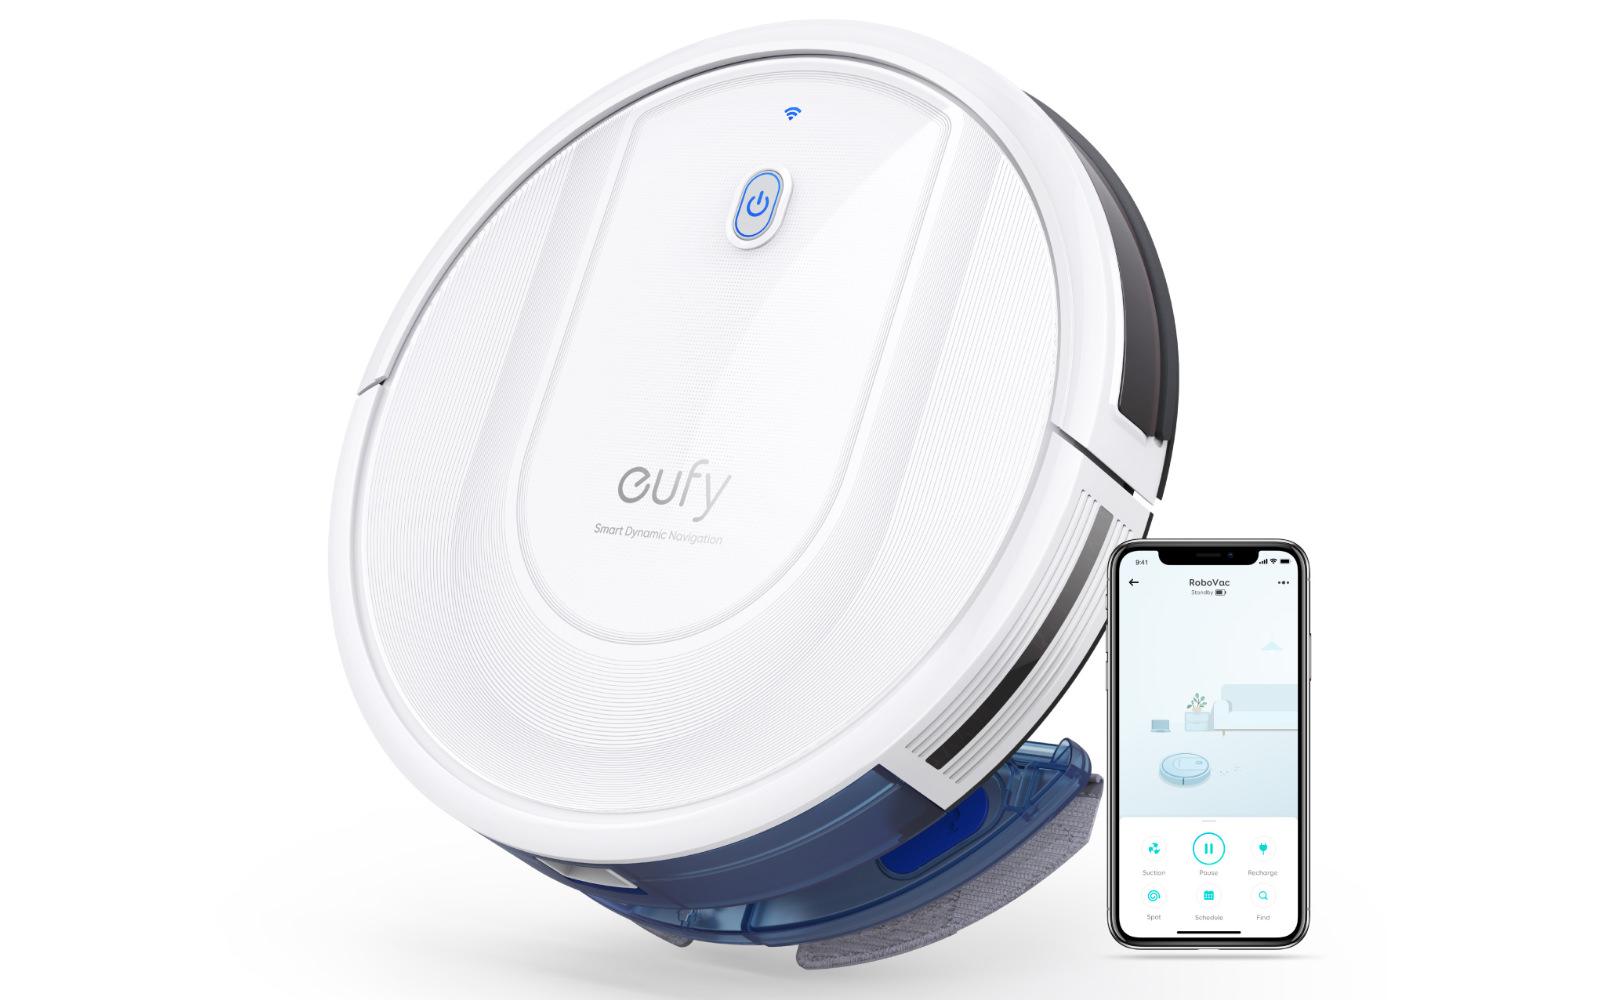 Eufy-RoboVac-G10-Hybrid_1.jpg